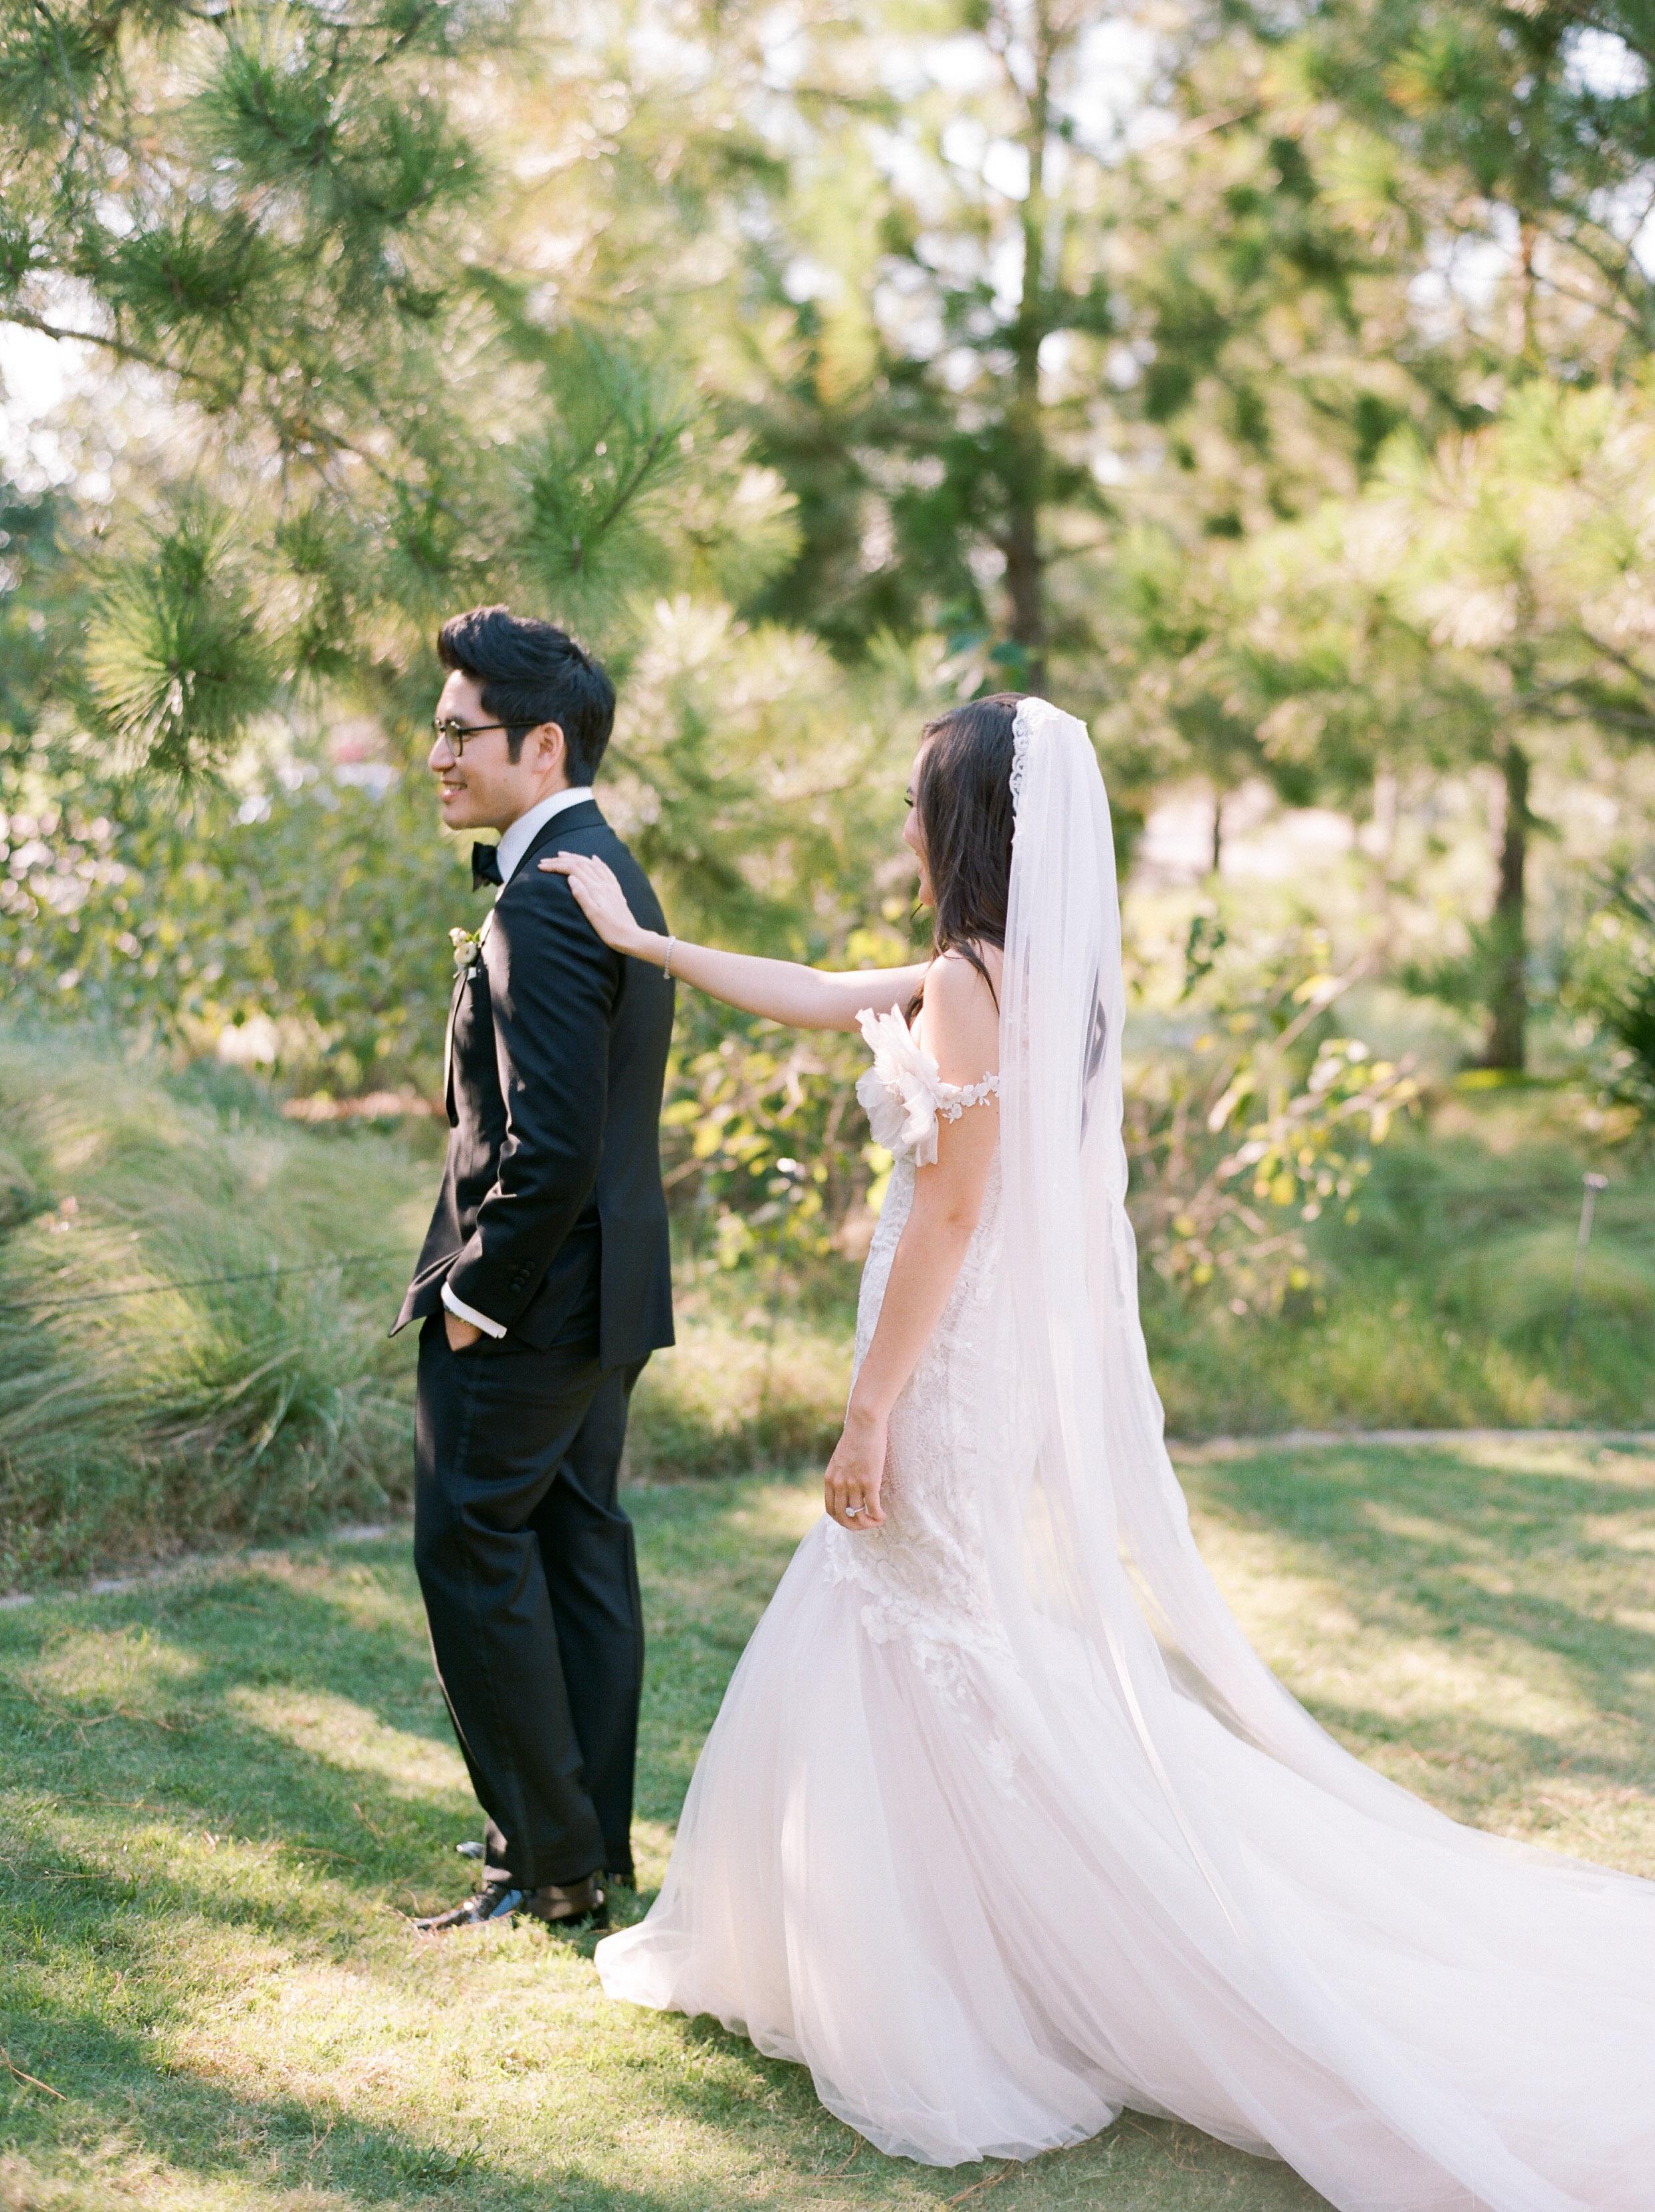 Martha-Stewart-Wedding-Dana-Fernandez-Photography-Josh-Texas-Film-Houston-Wedding-Fine-Art-Photographer-McGovern-Centennial-Gardens-Top-Best-159.jpg